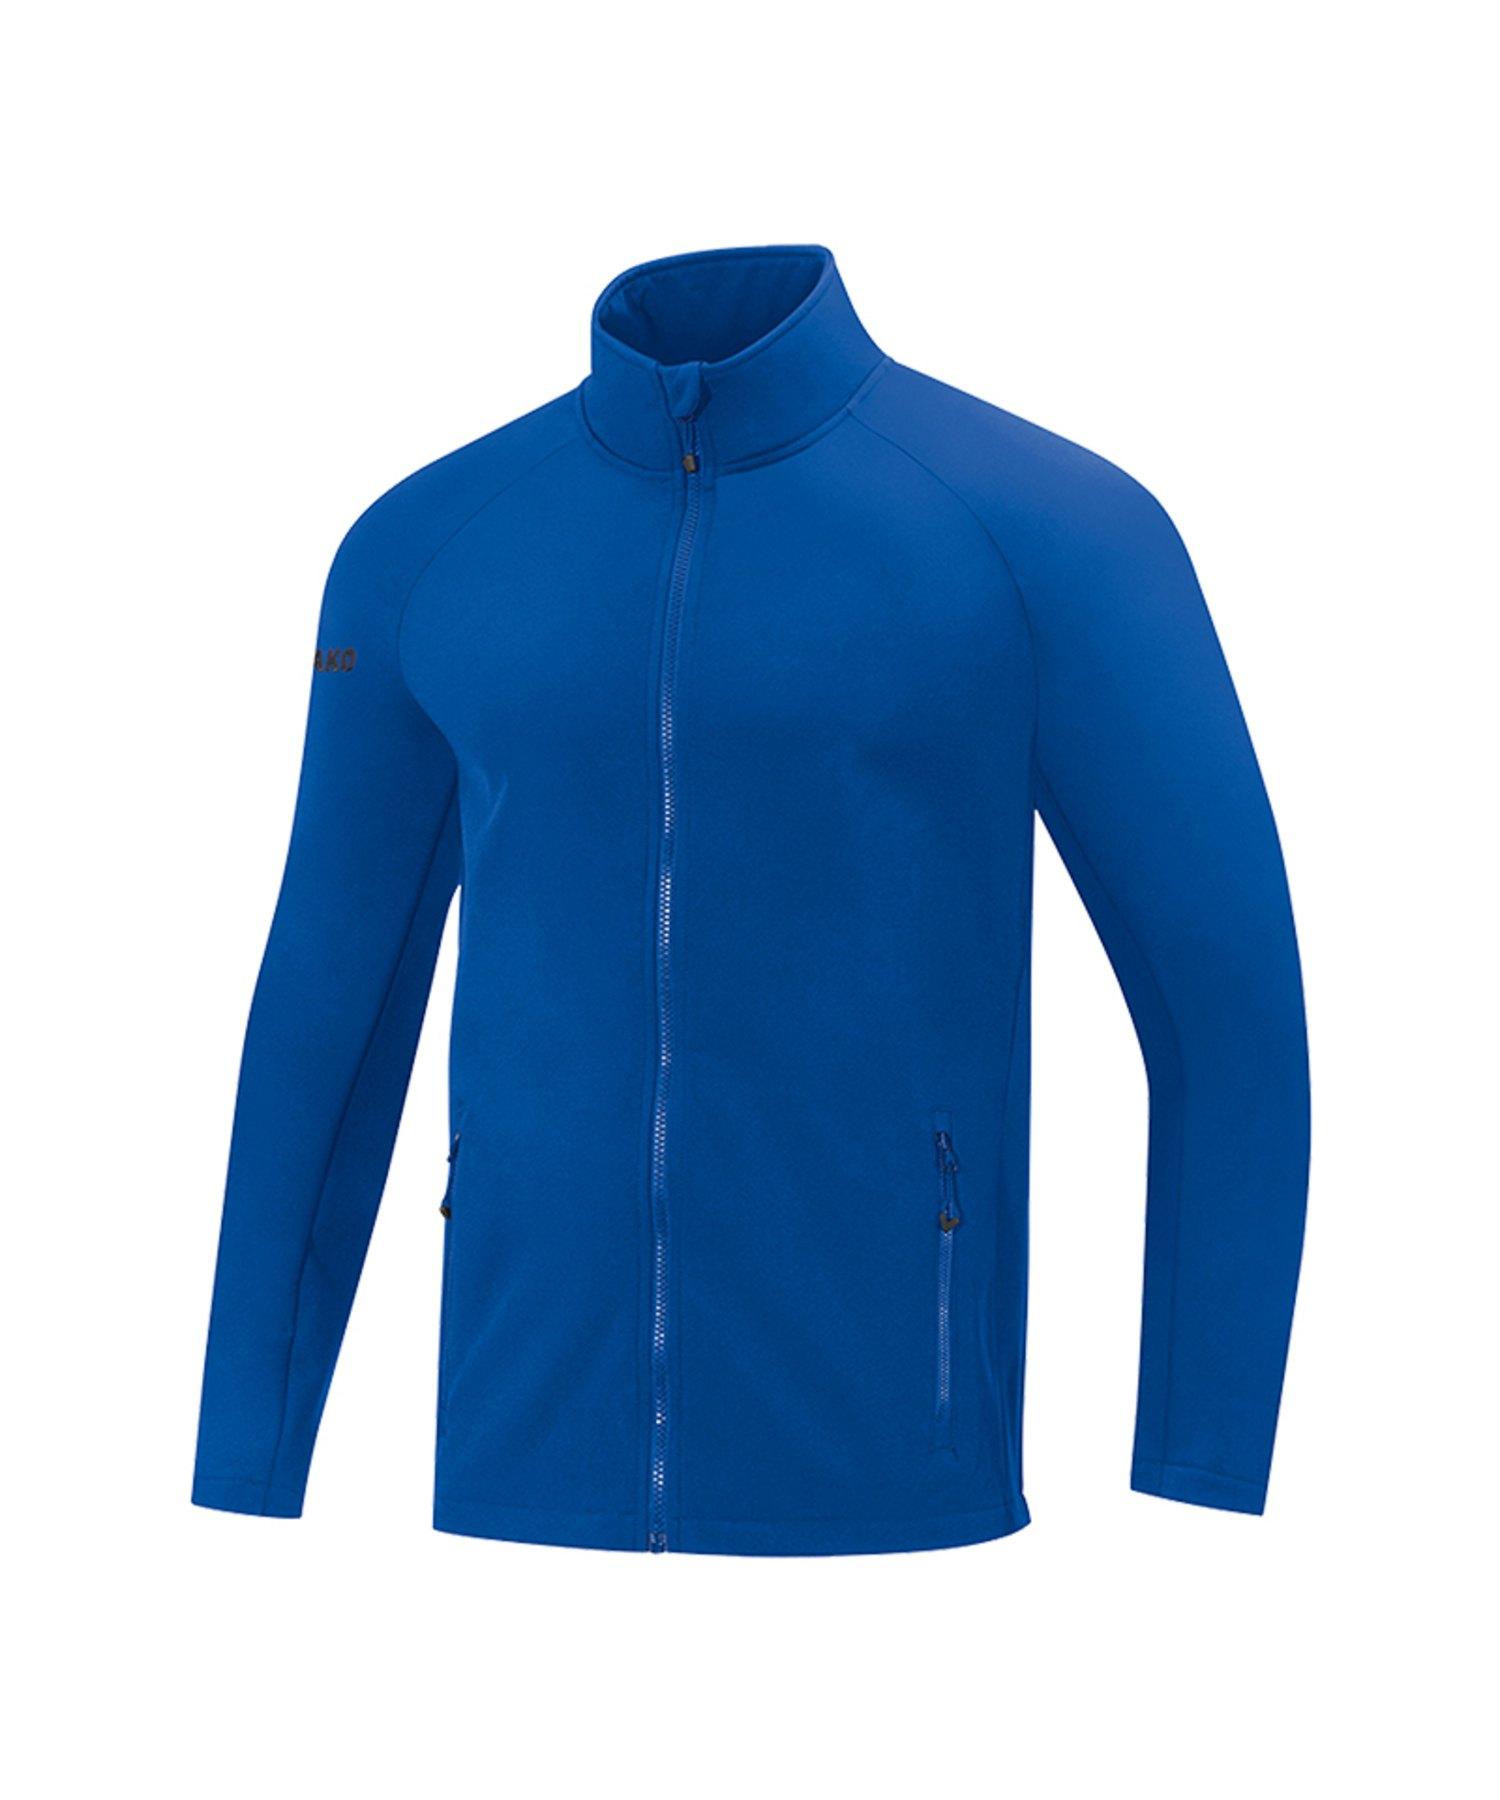 Jako Team Softshelljacke Damen Blau F04 - Blau